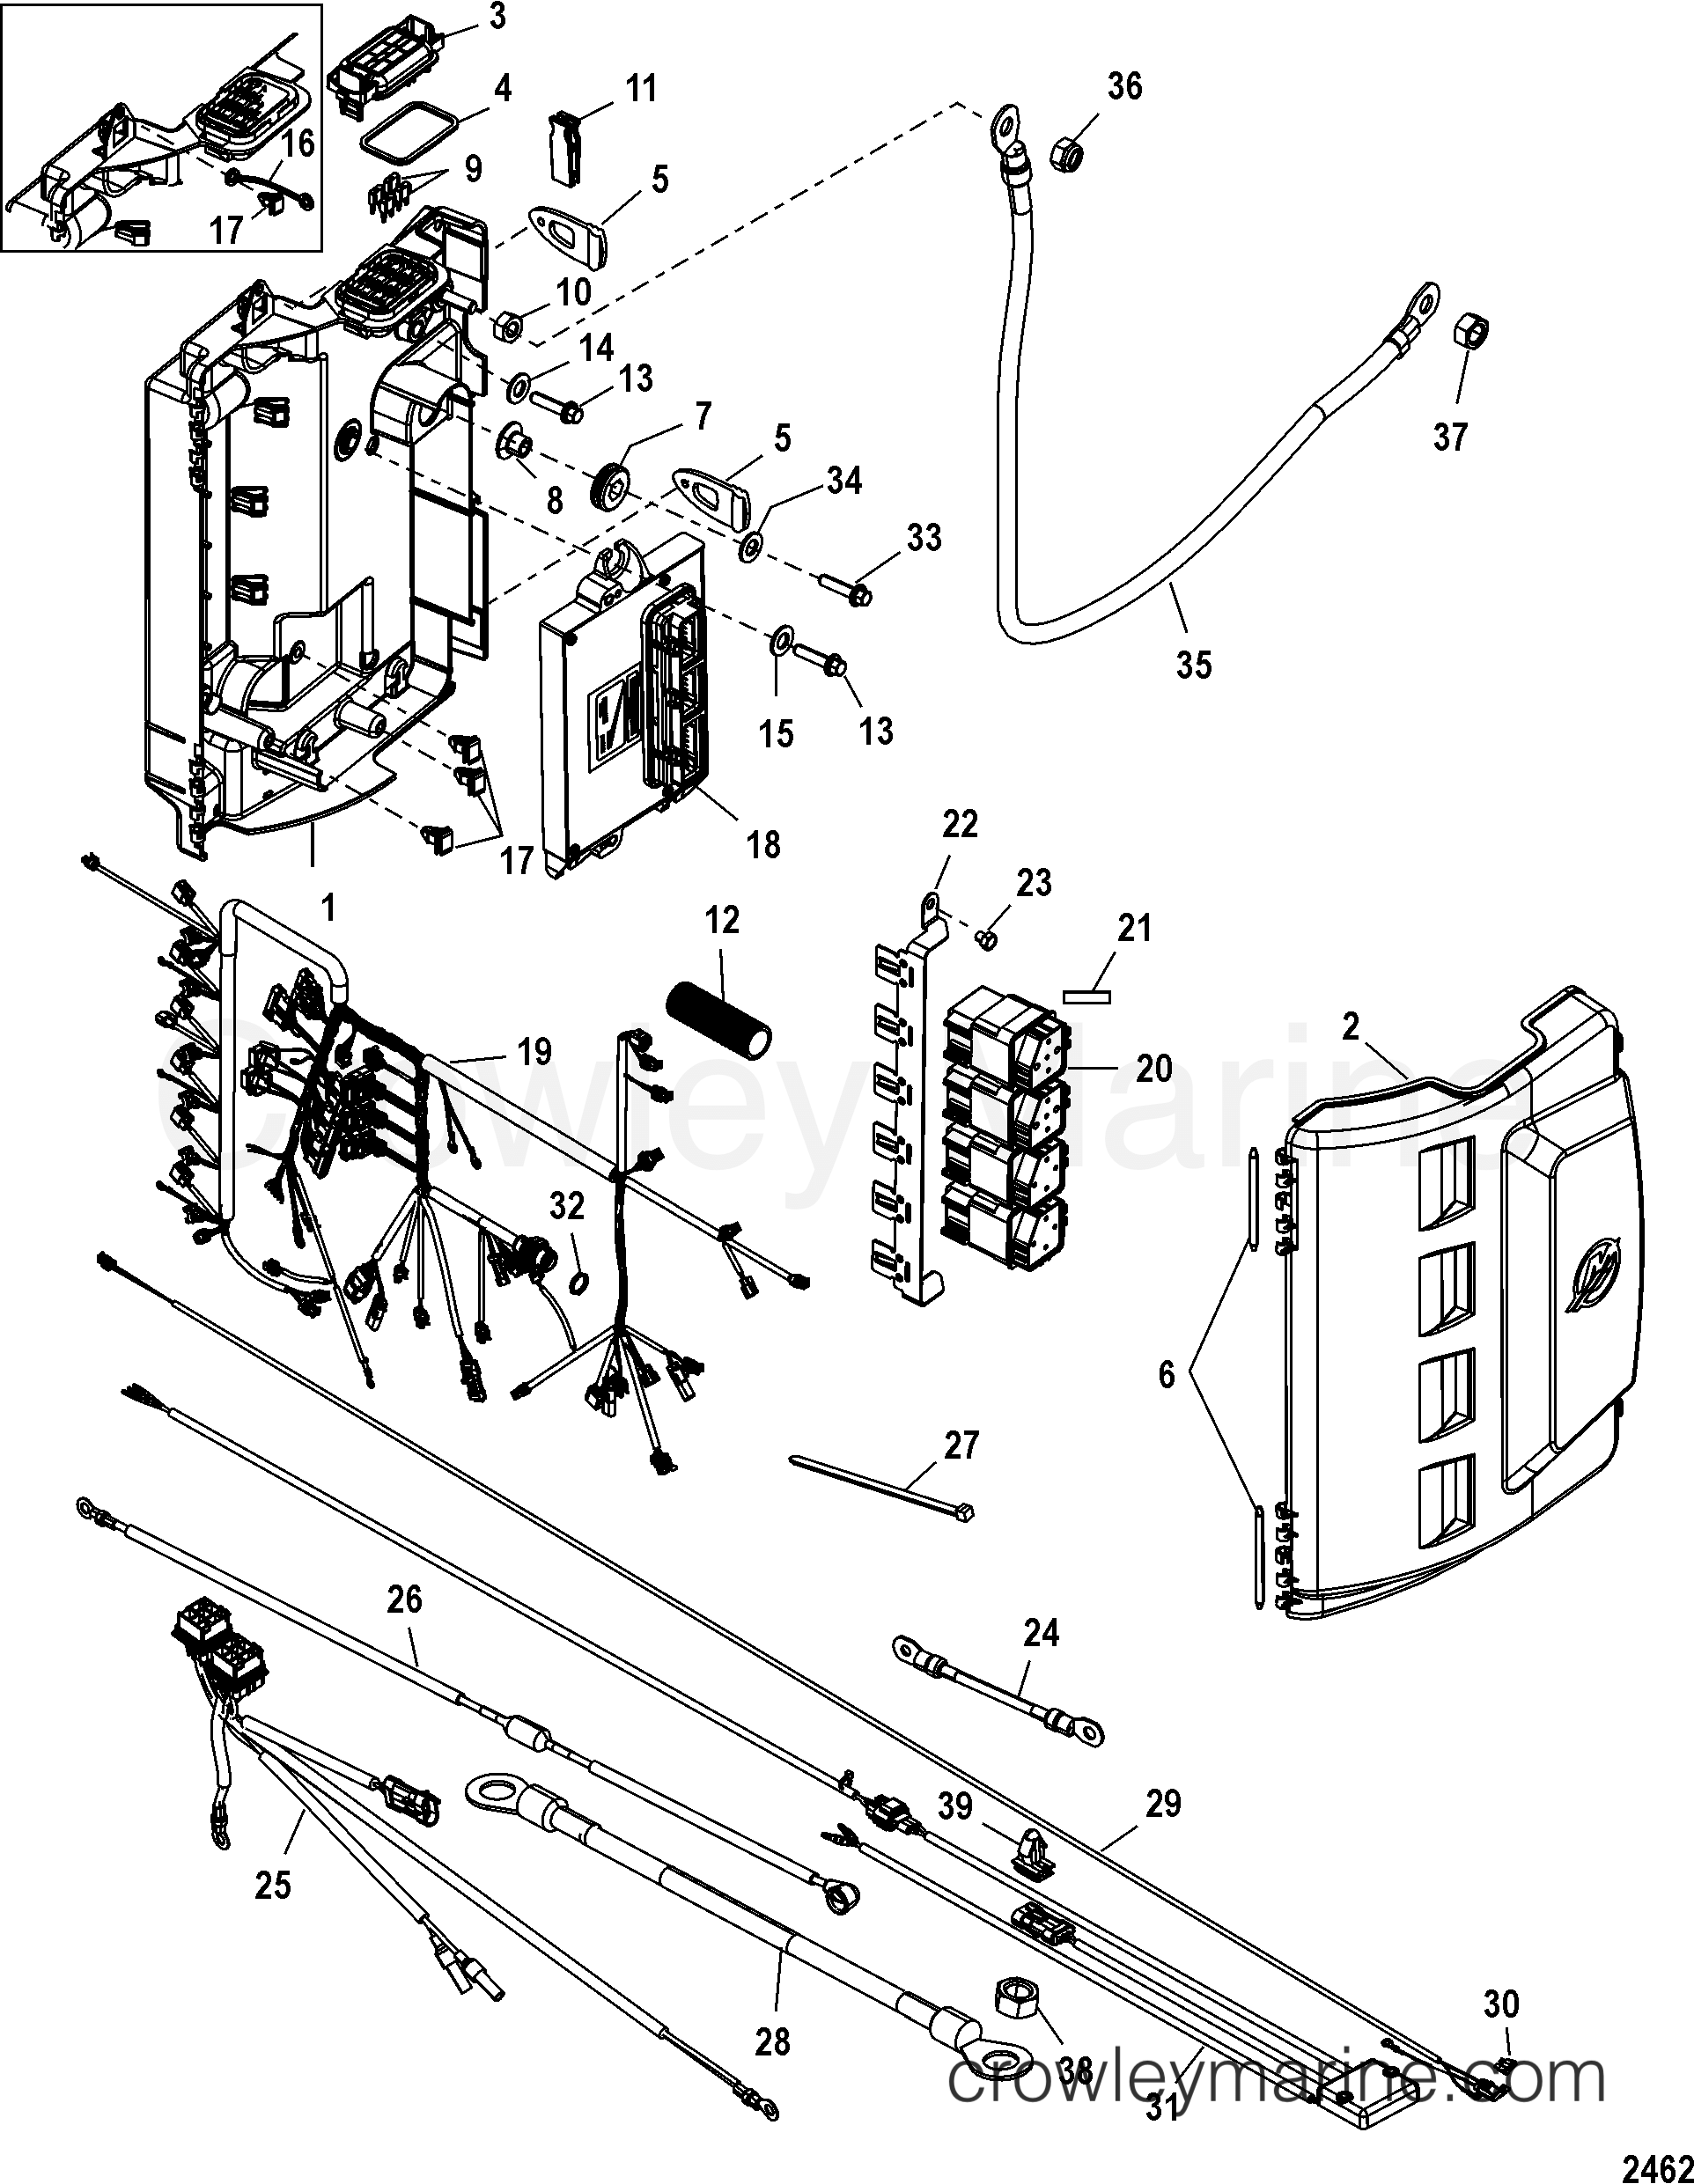 electrical box components 2005 mariner outboard 200 cxl. Black Bedroom Furniture Sets. Home Design Ideas